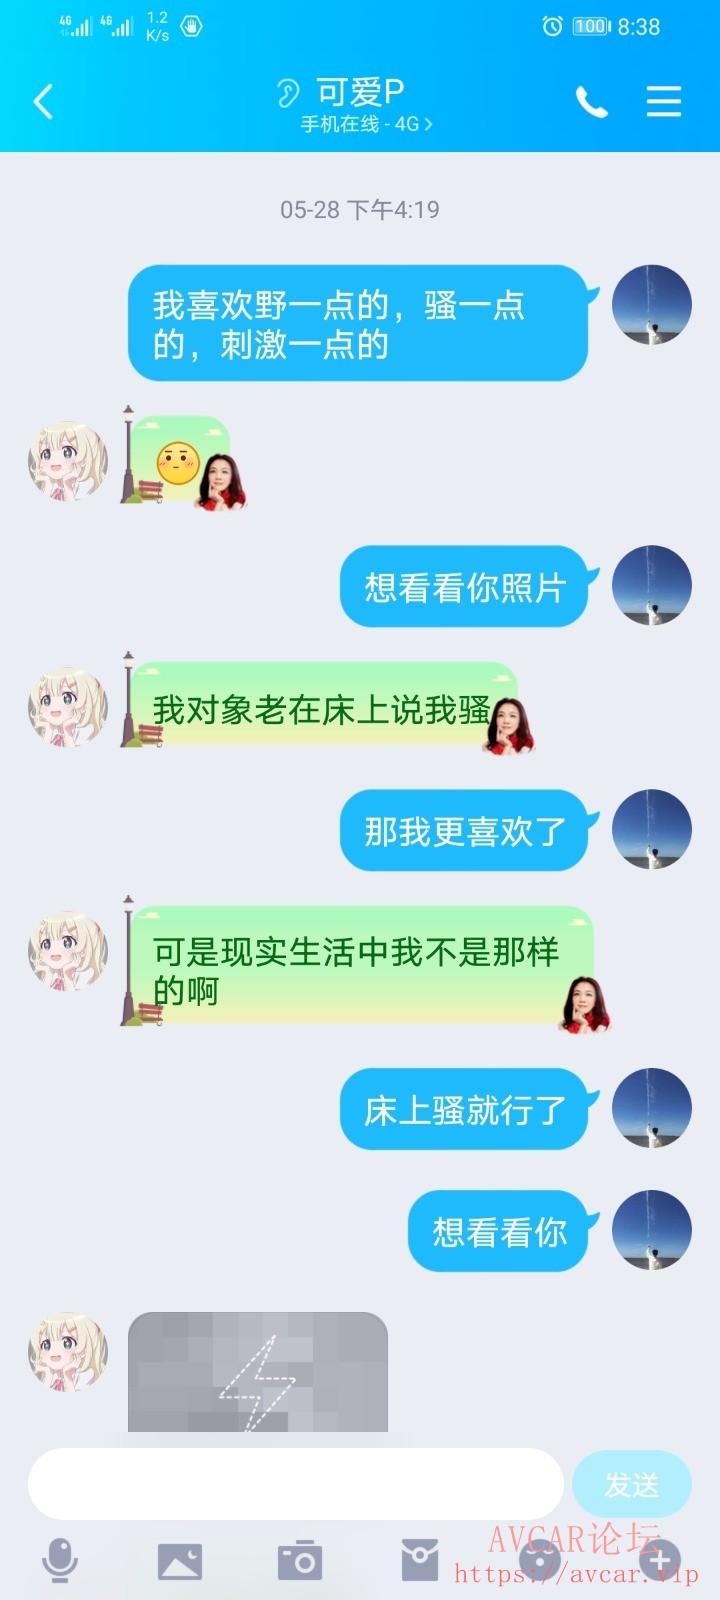 Screenshot_20211011_203850_com.tencent.mobileqq.jpg